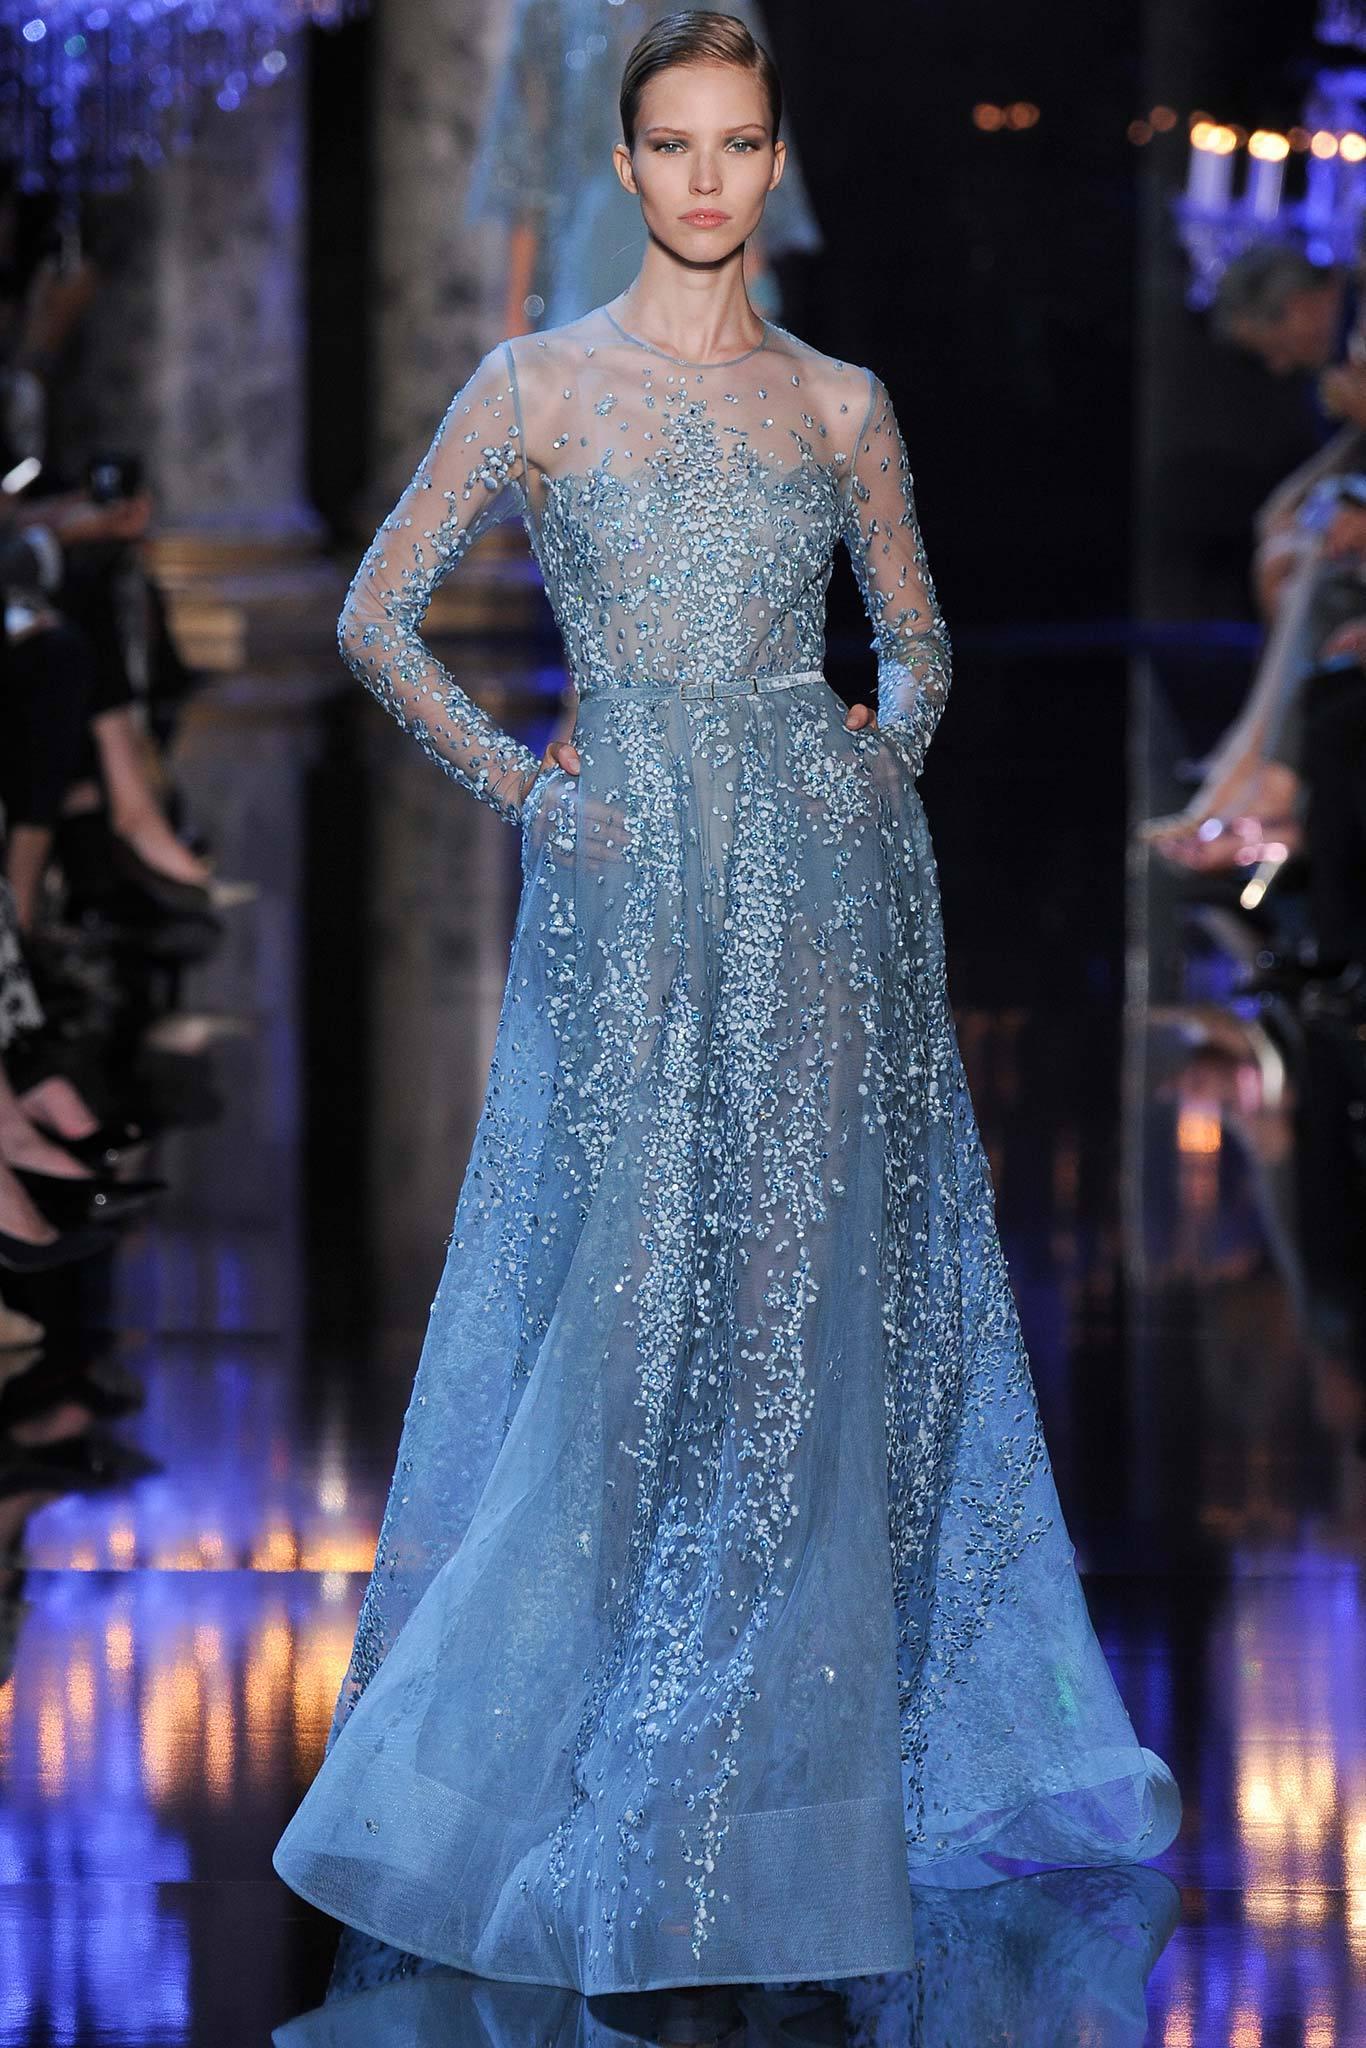 Elie-Saab-Couture-Fall2014-02.JPG